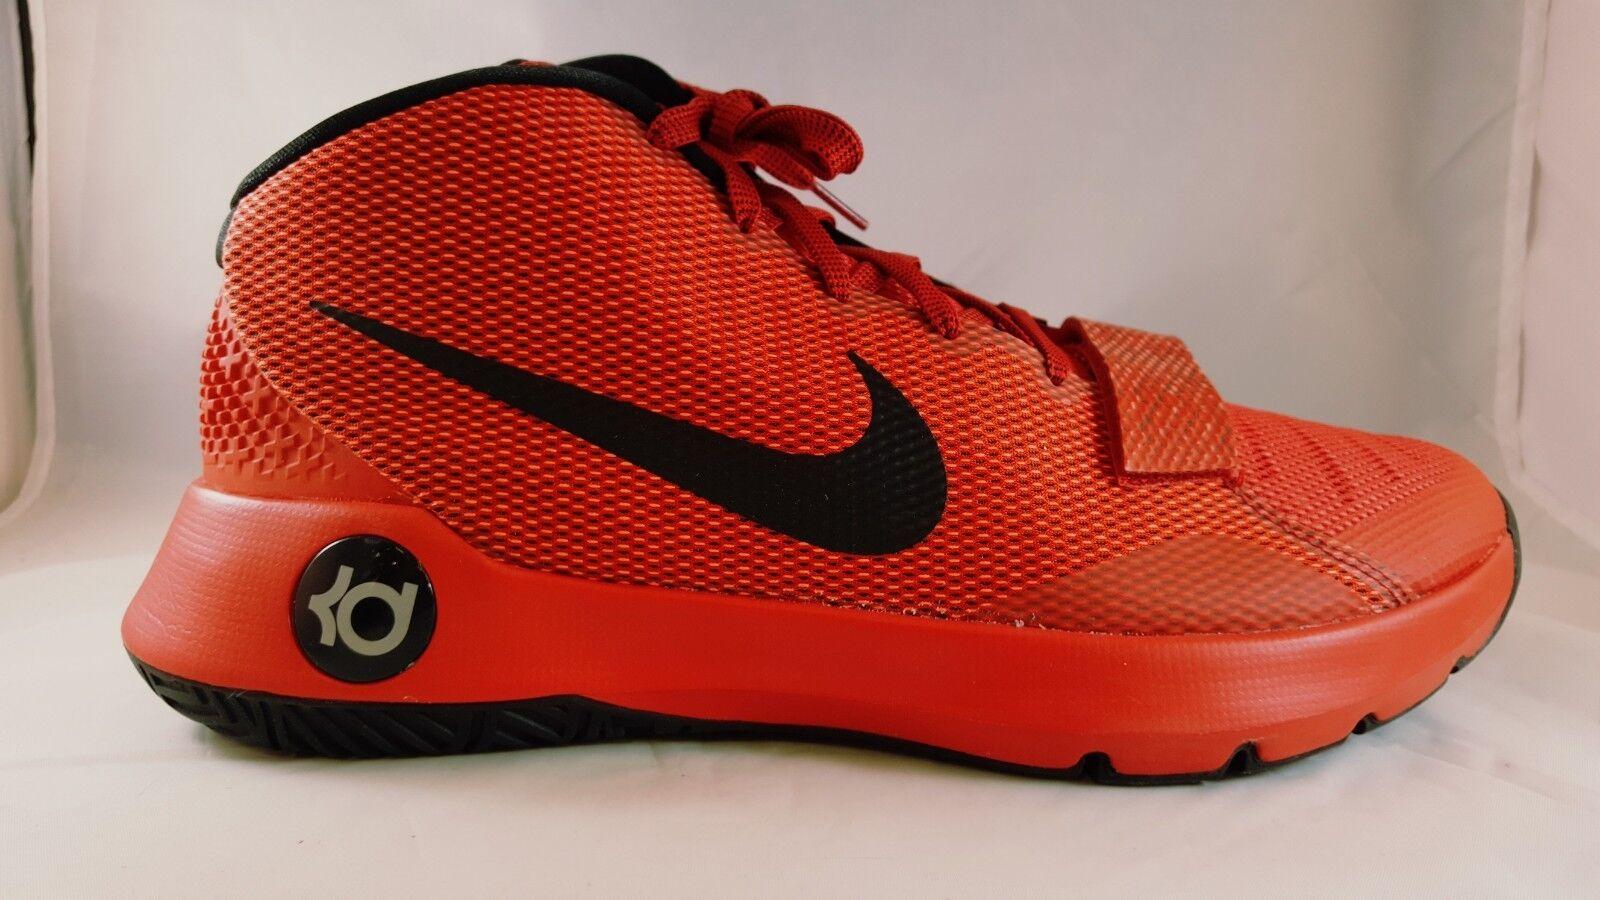 Nike Nike Nike KD Trey 5 III Men's Basketball Shoe 749377 606 Size 14 b8f553